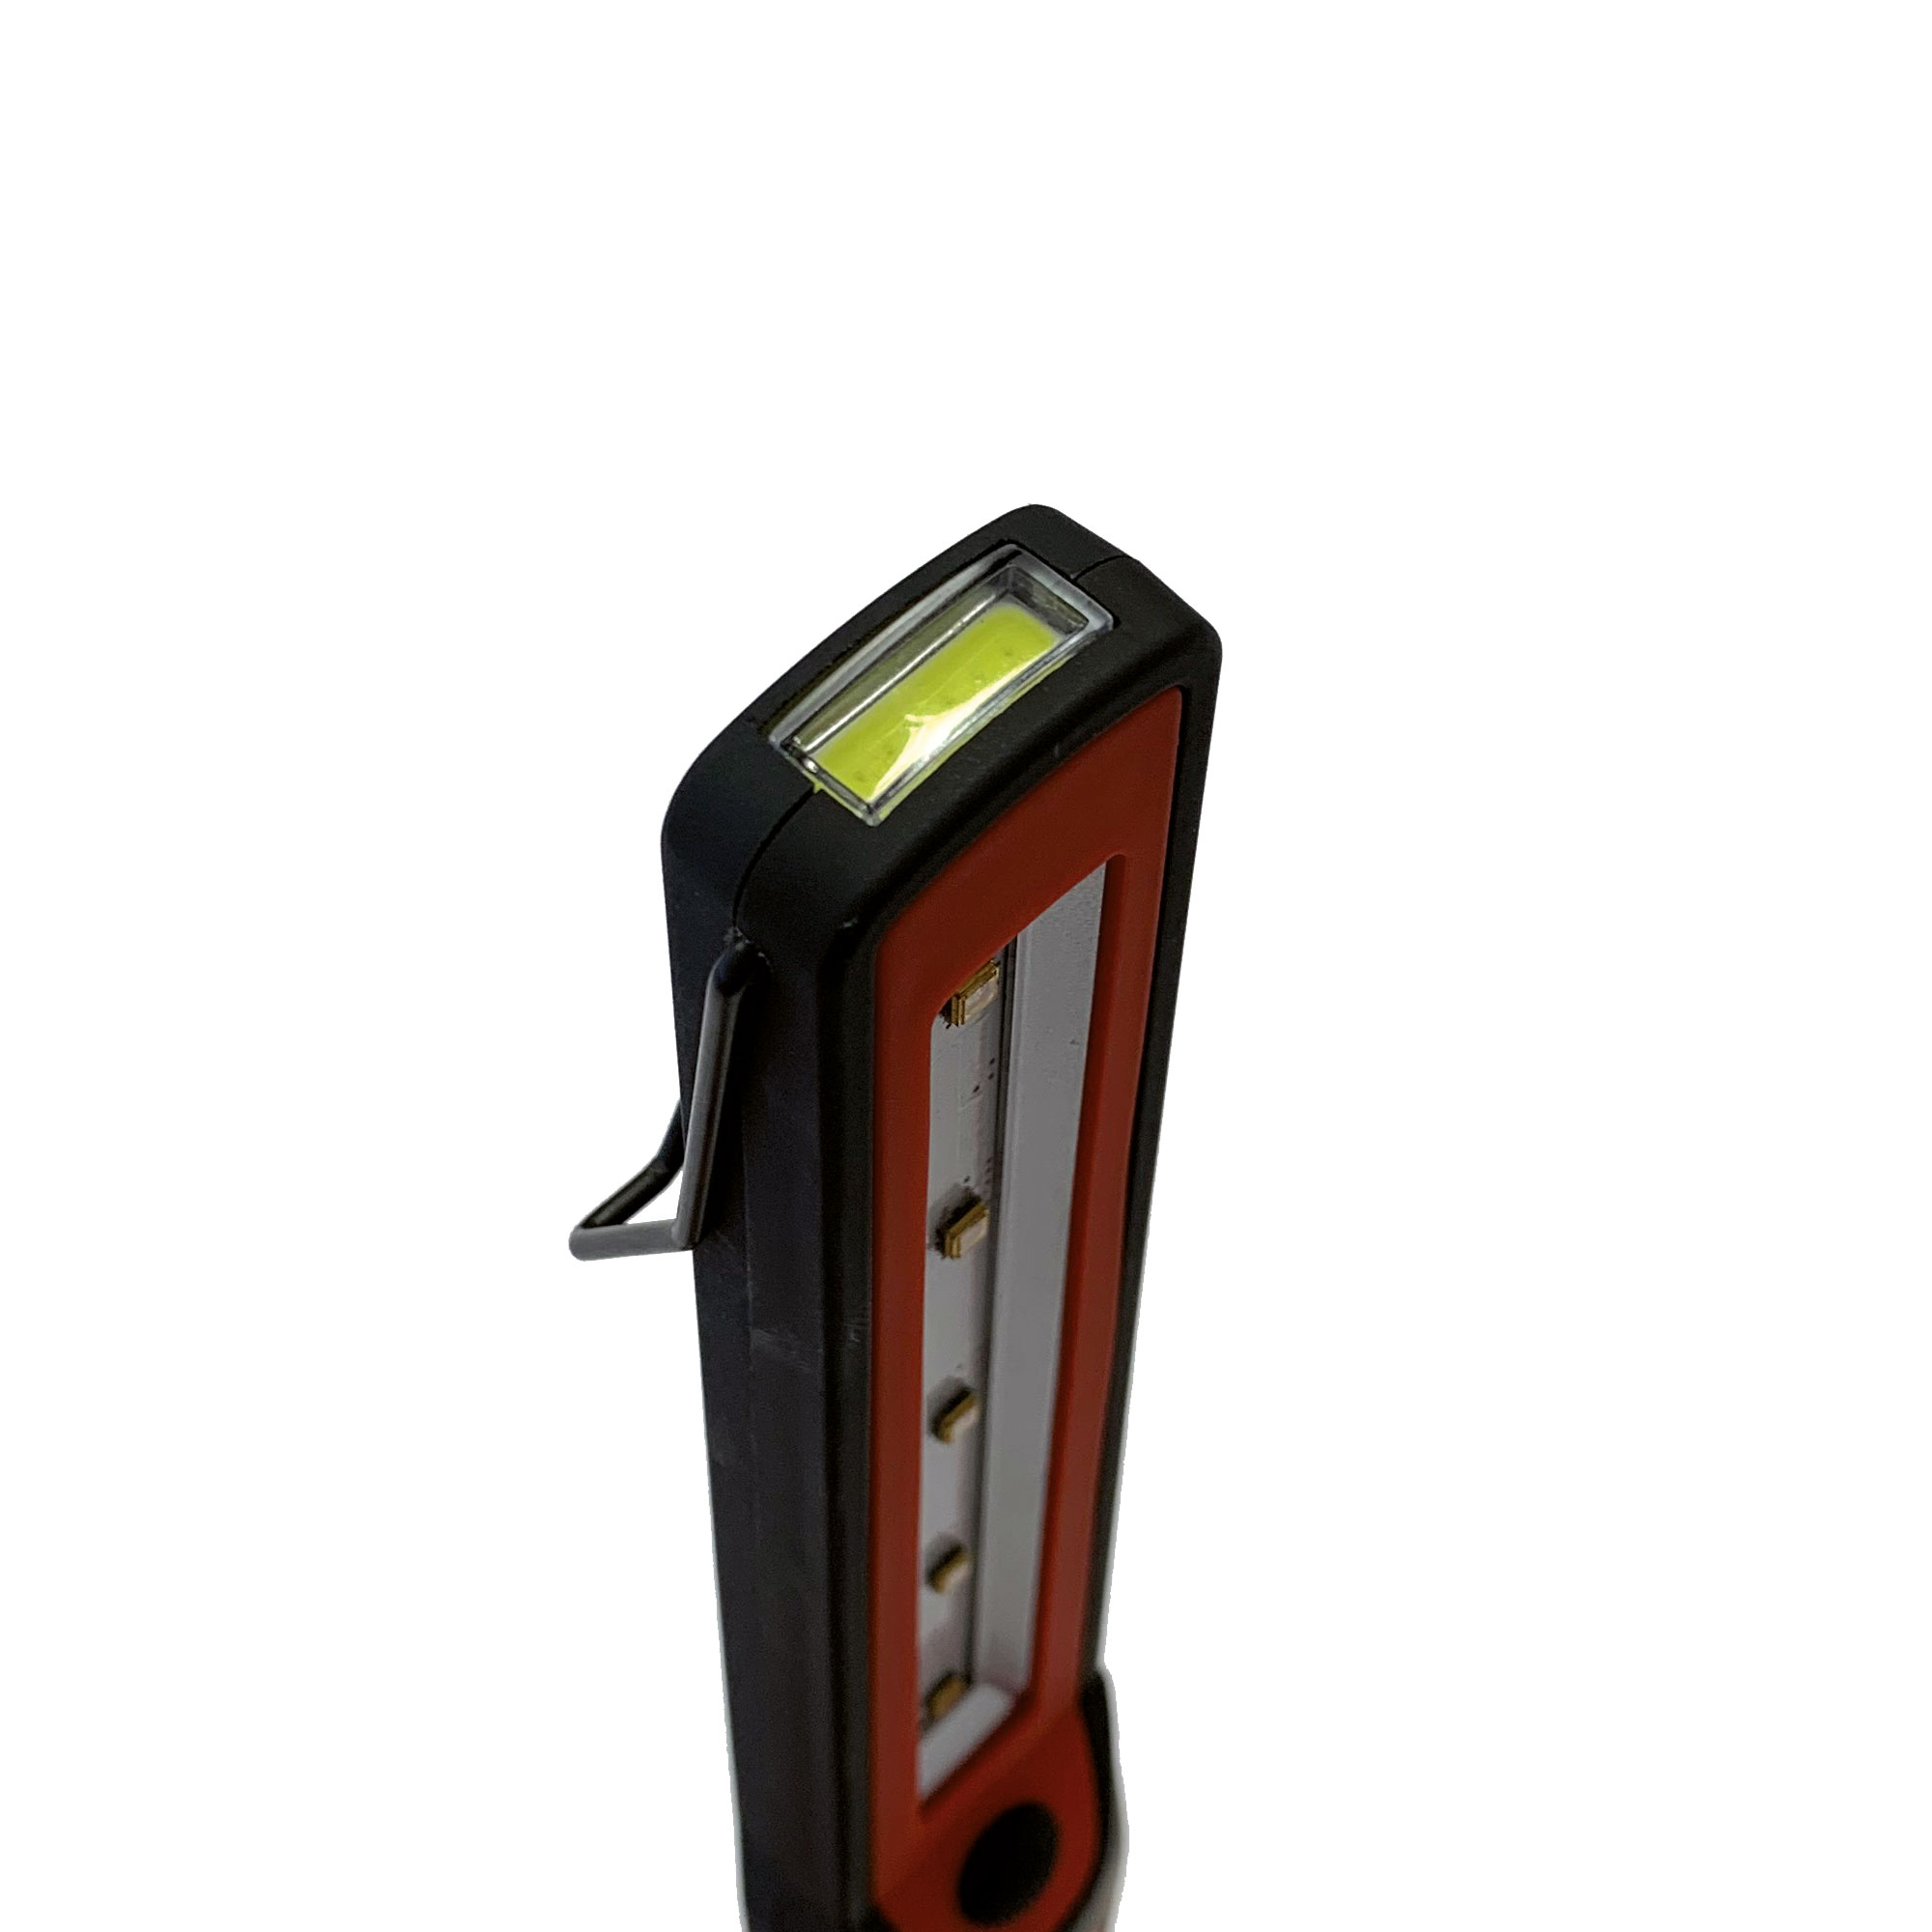 UVC LED Lampe zur chemiefreien Desinfektion